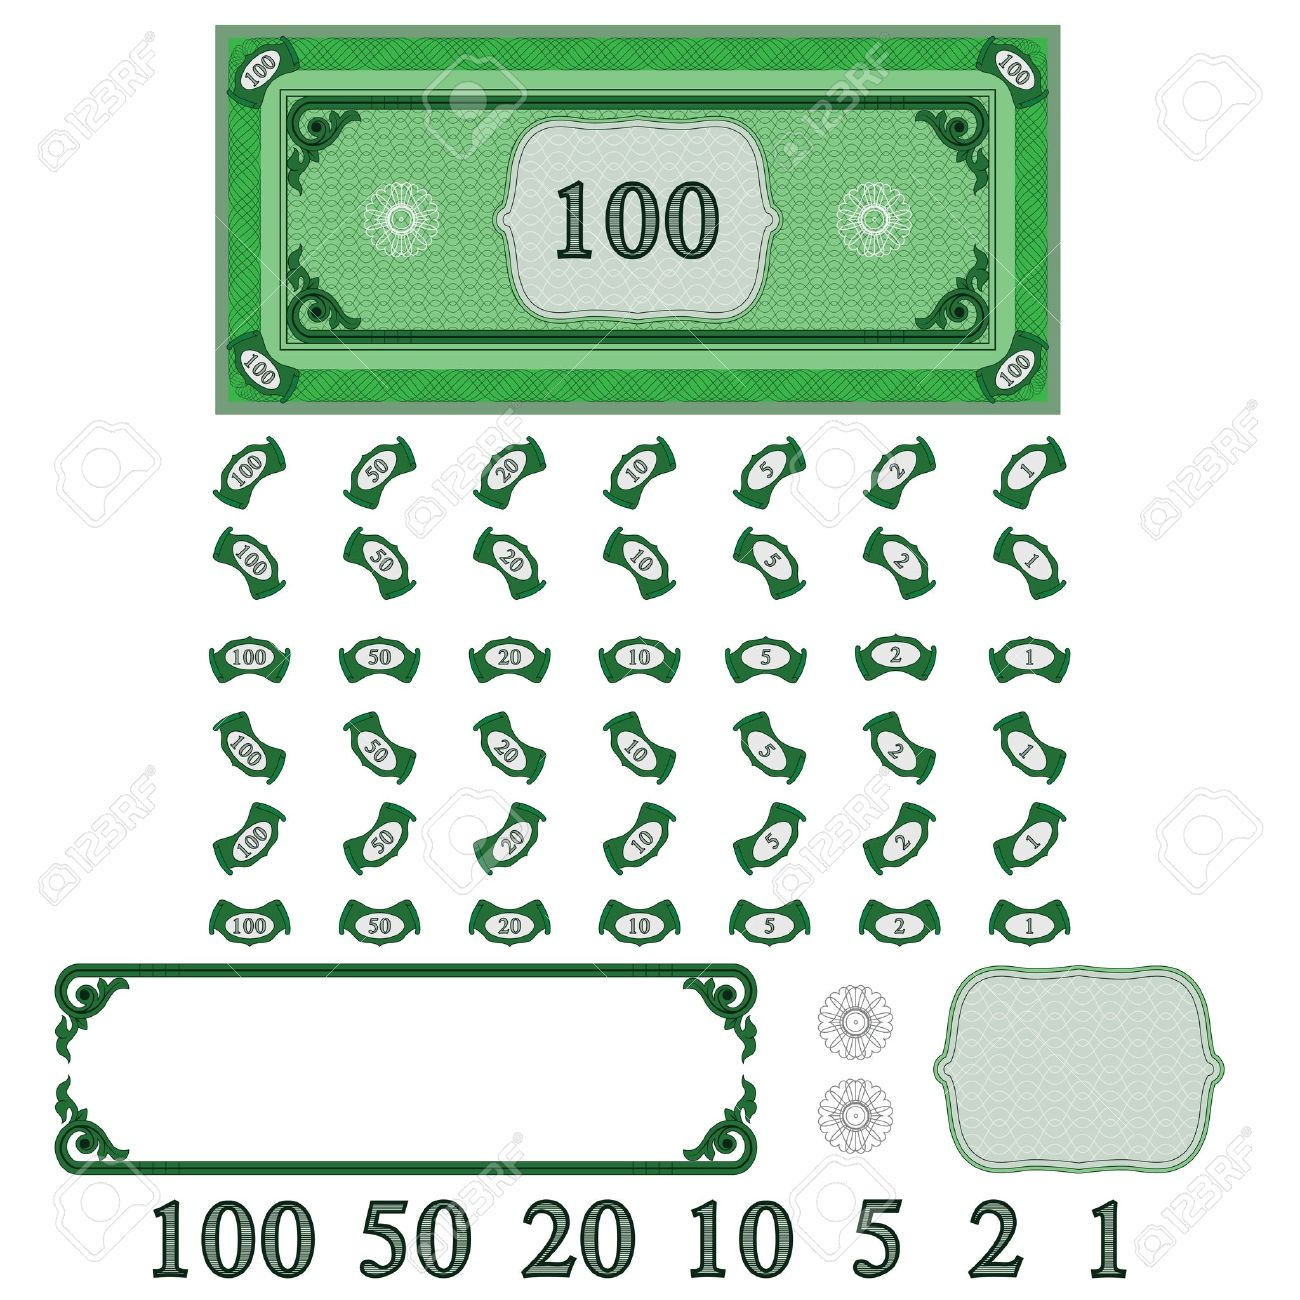 Play money (make your money set) - 12181417